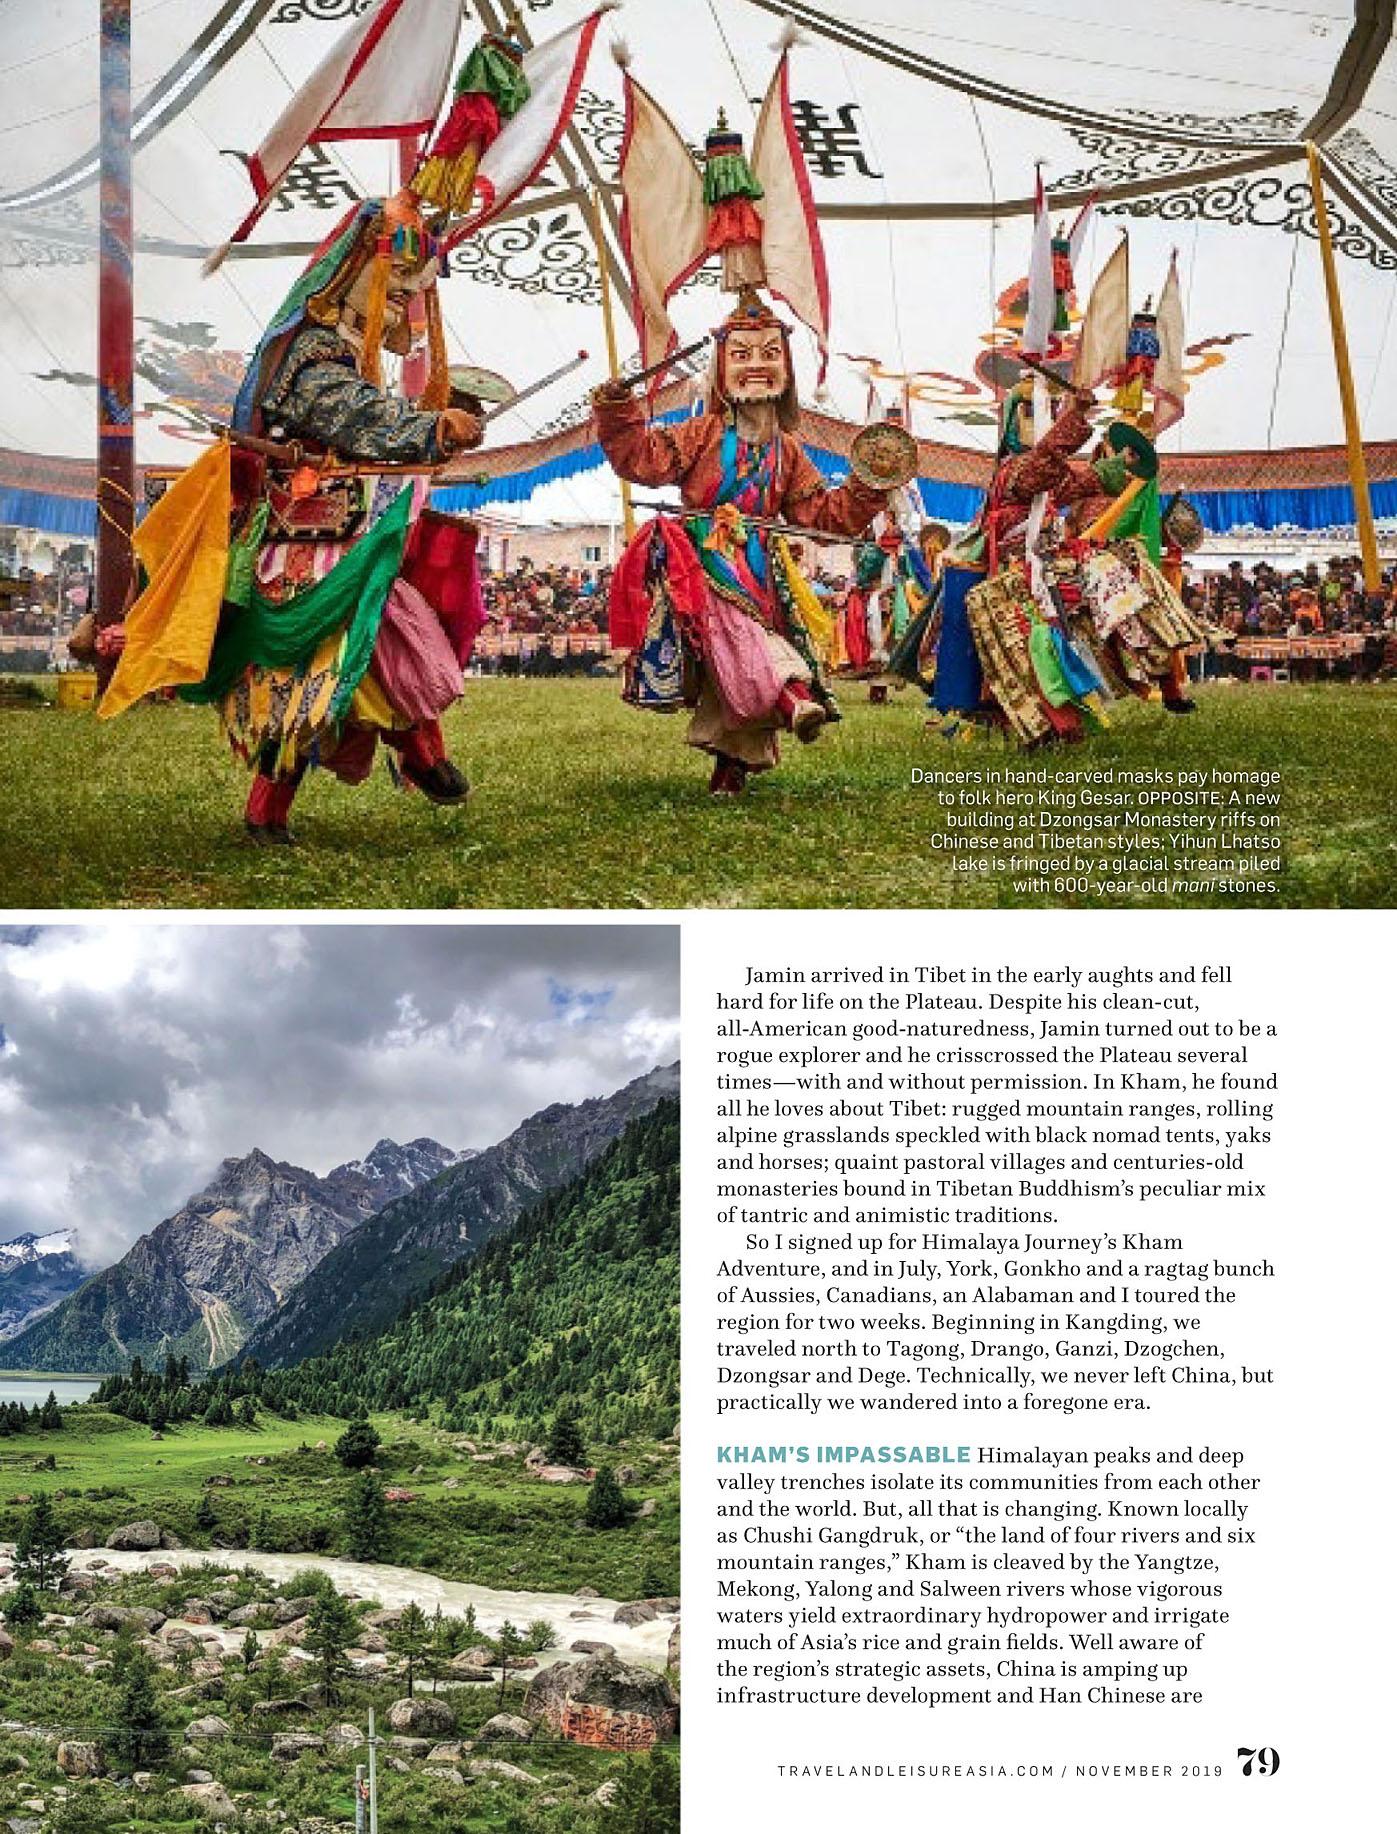 Travel & Leisure SE Asia 2019-11 Tibet 05.jpg